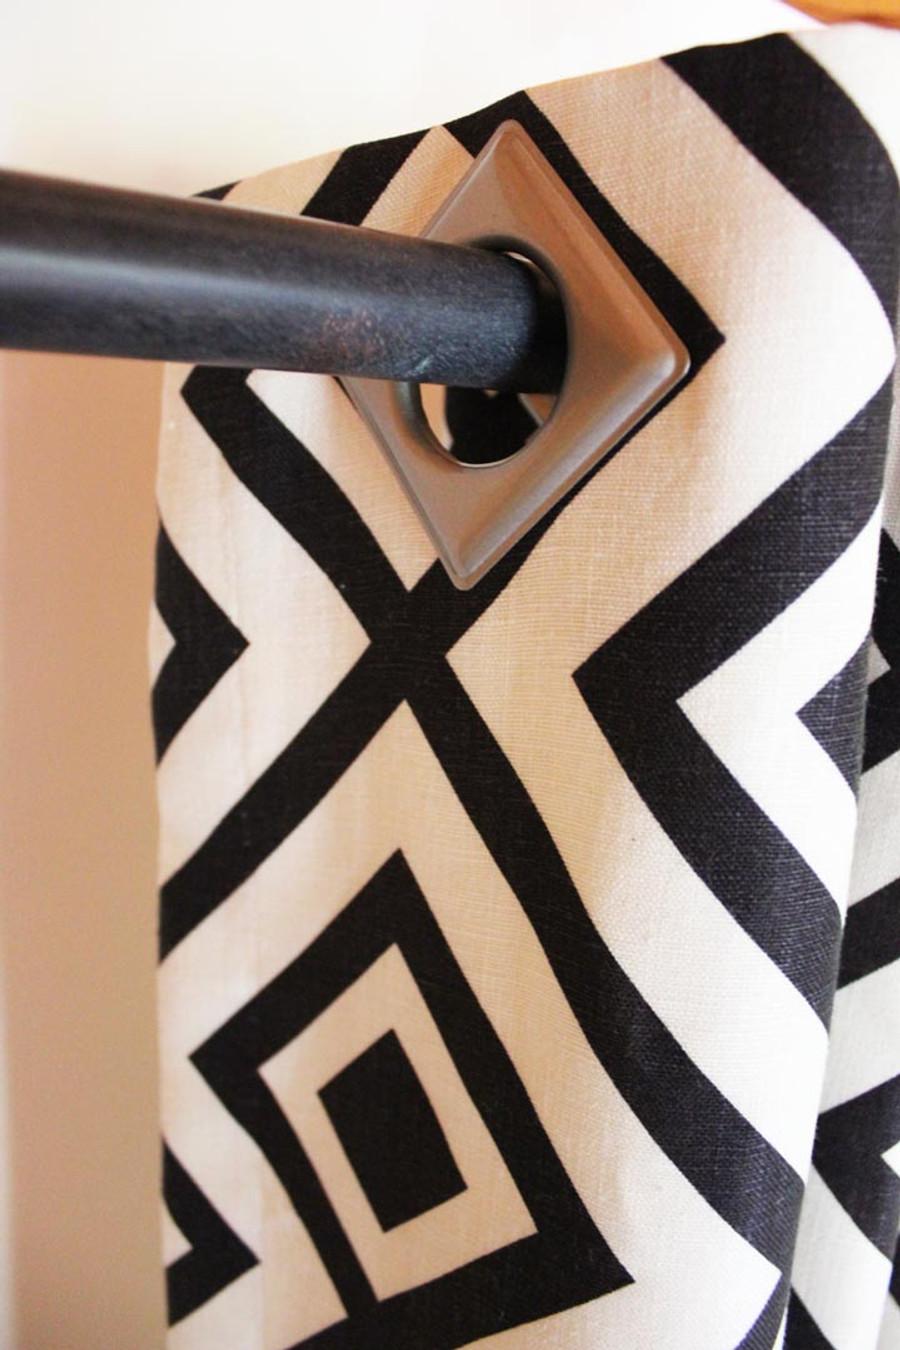 Custom Grommet Drapes by Lynn Chalk in David Hicks La Fiorentina Domino (Grommet is in Matte Nickel)